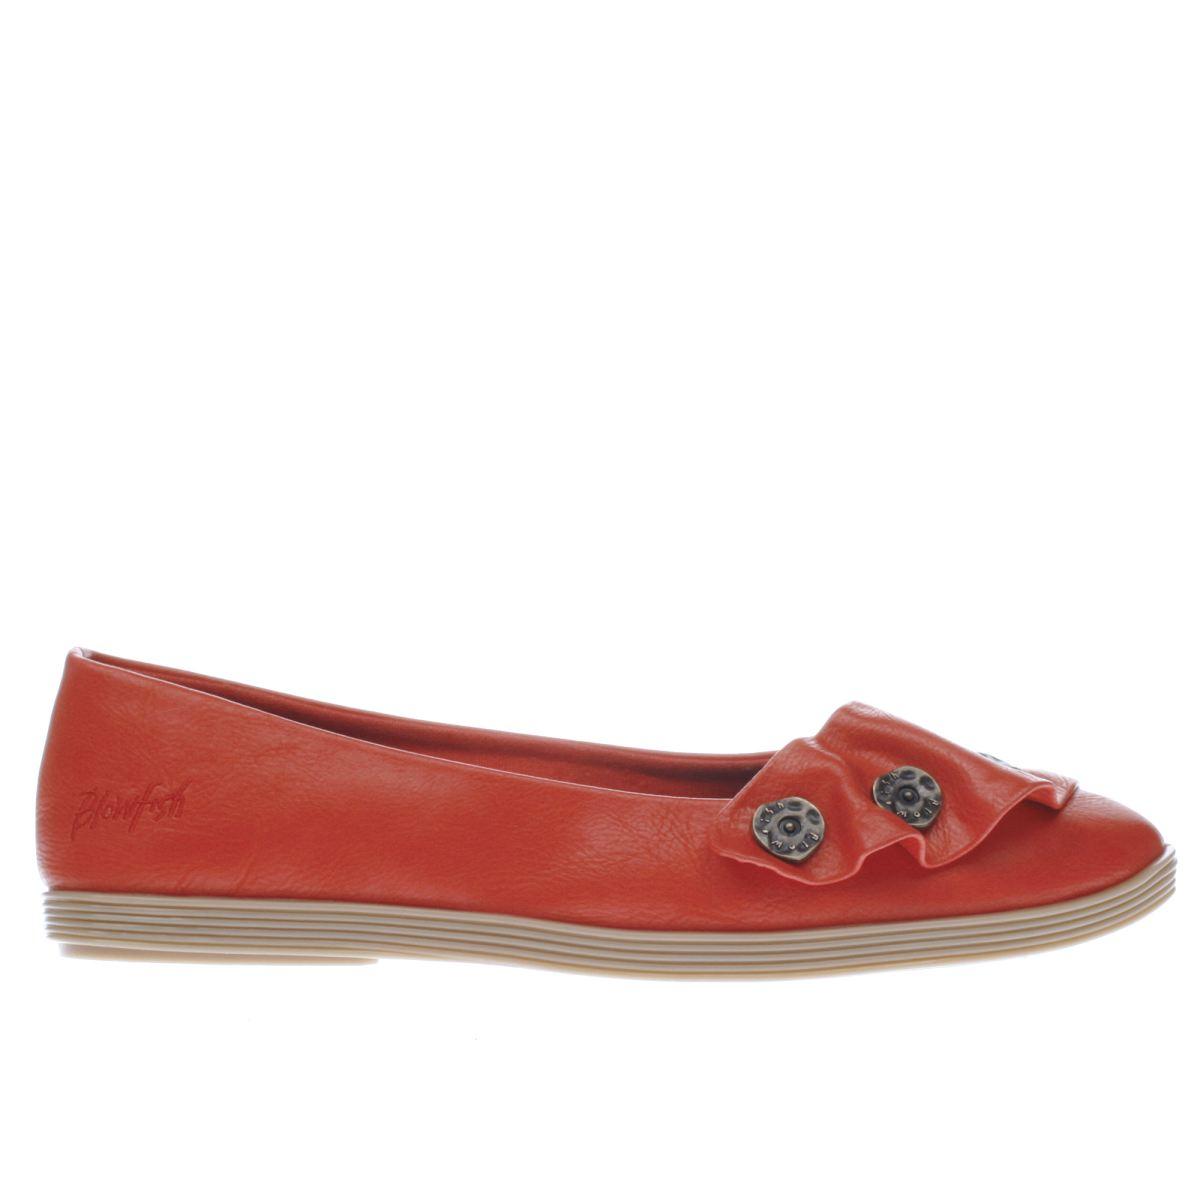 blowfish red garden flat shoes